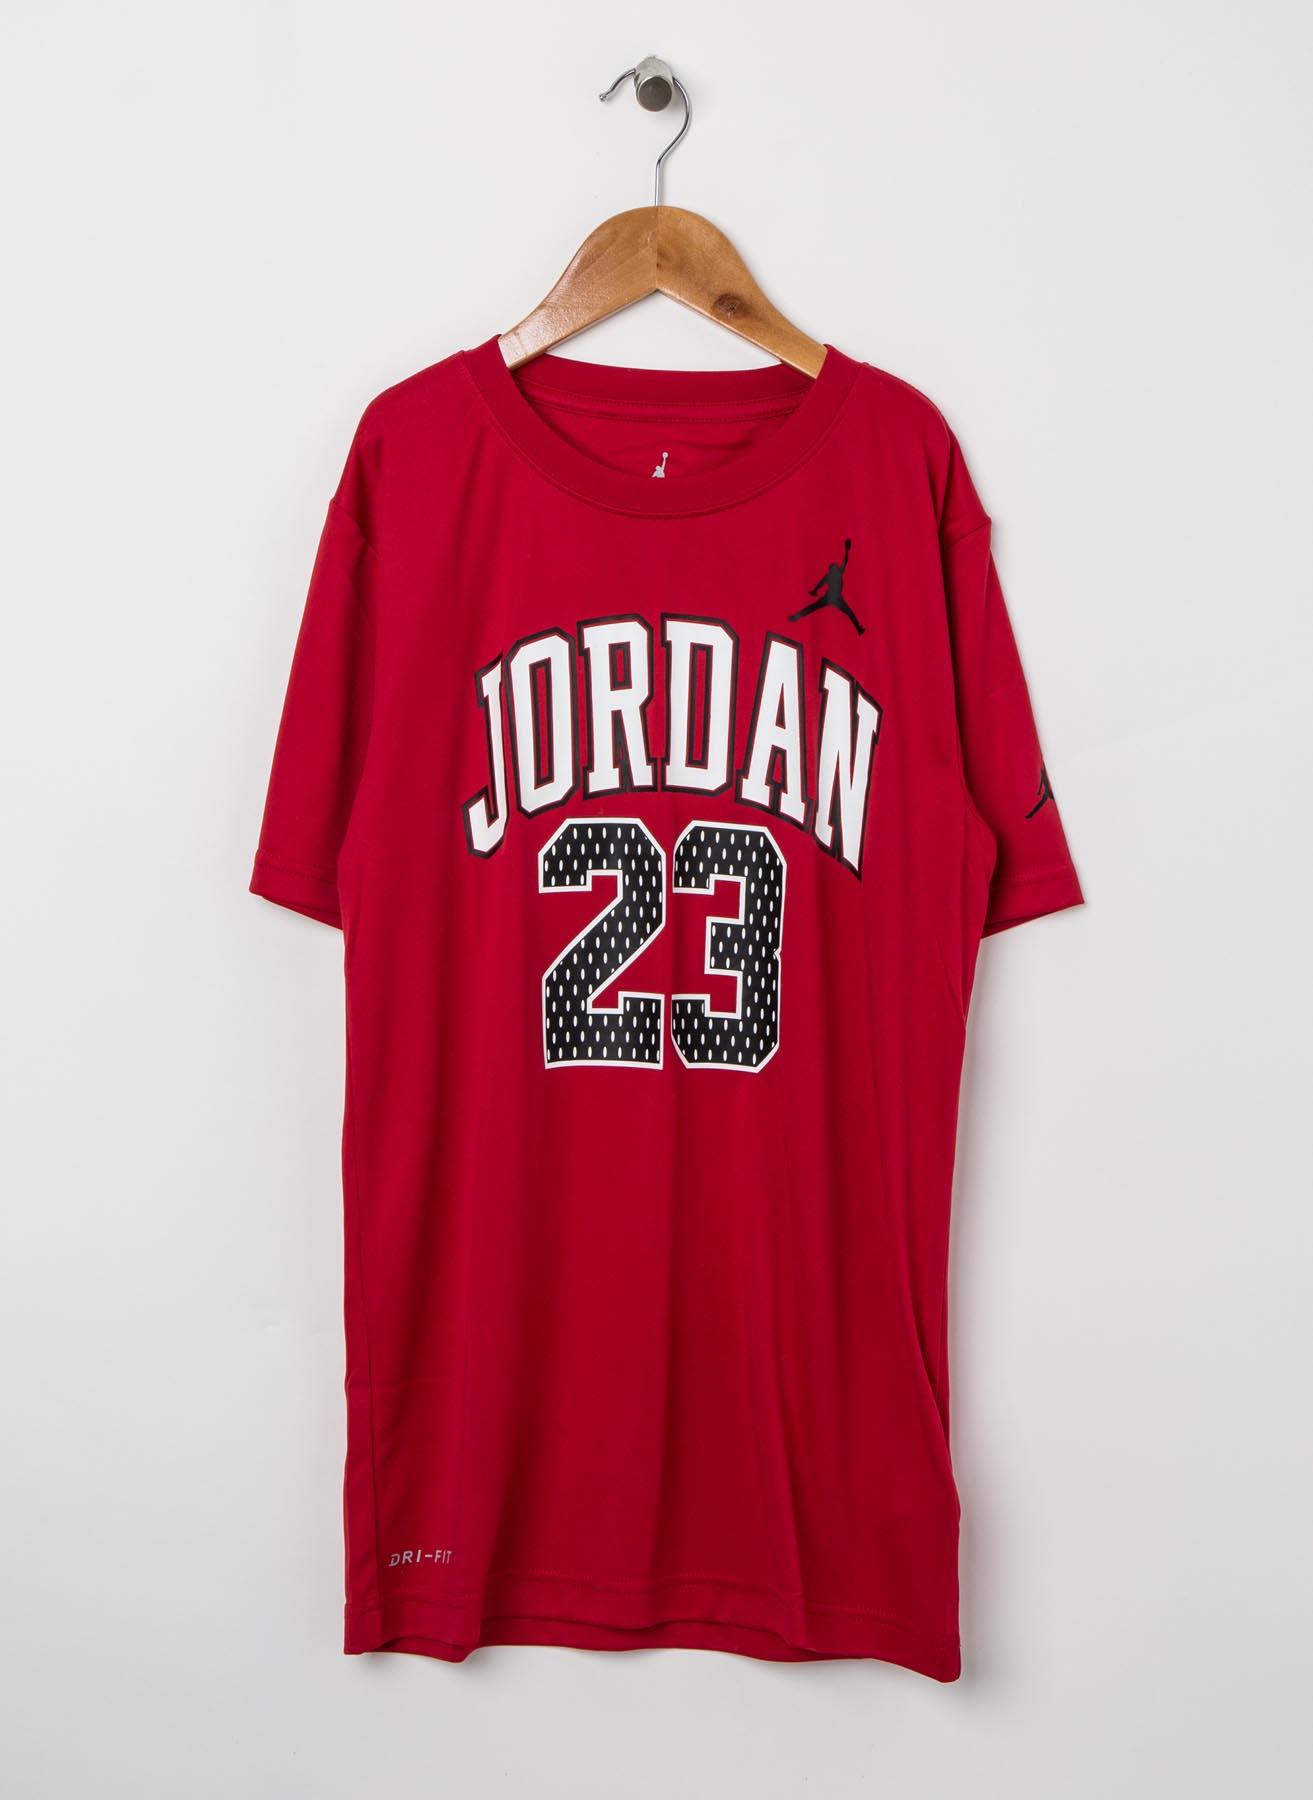 Nike T-Shirt L 5001922383001 Ürün Resmi